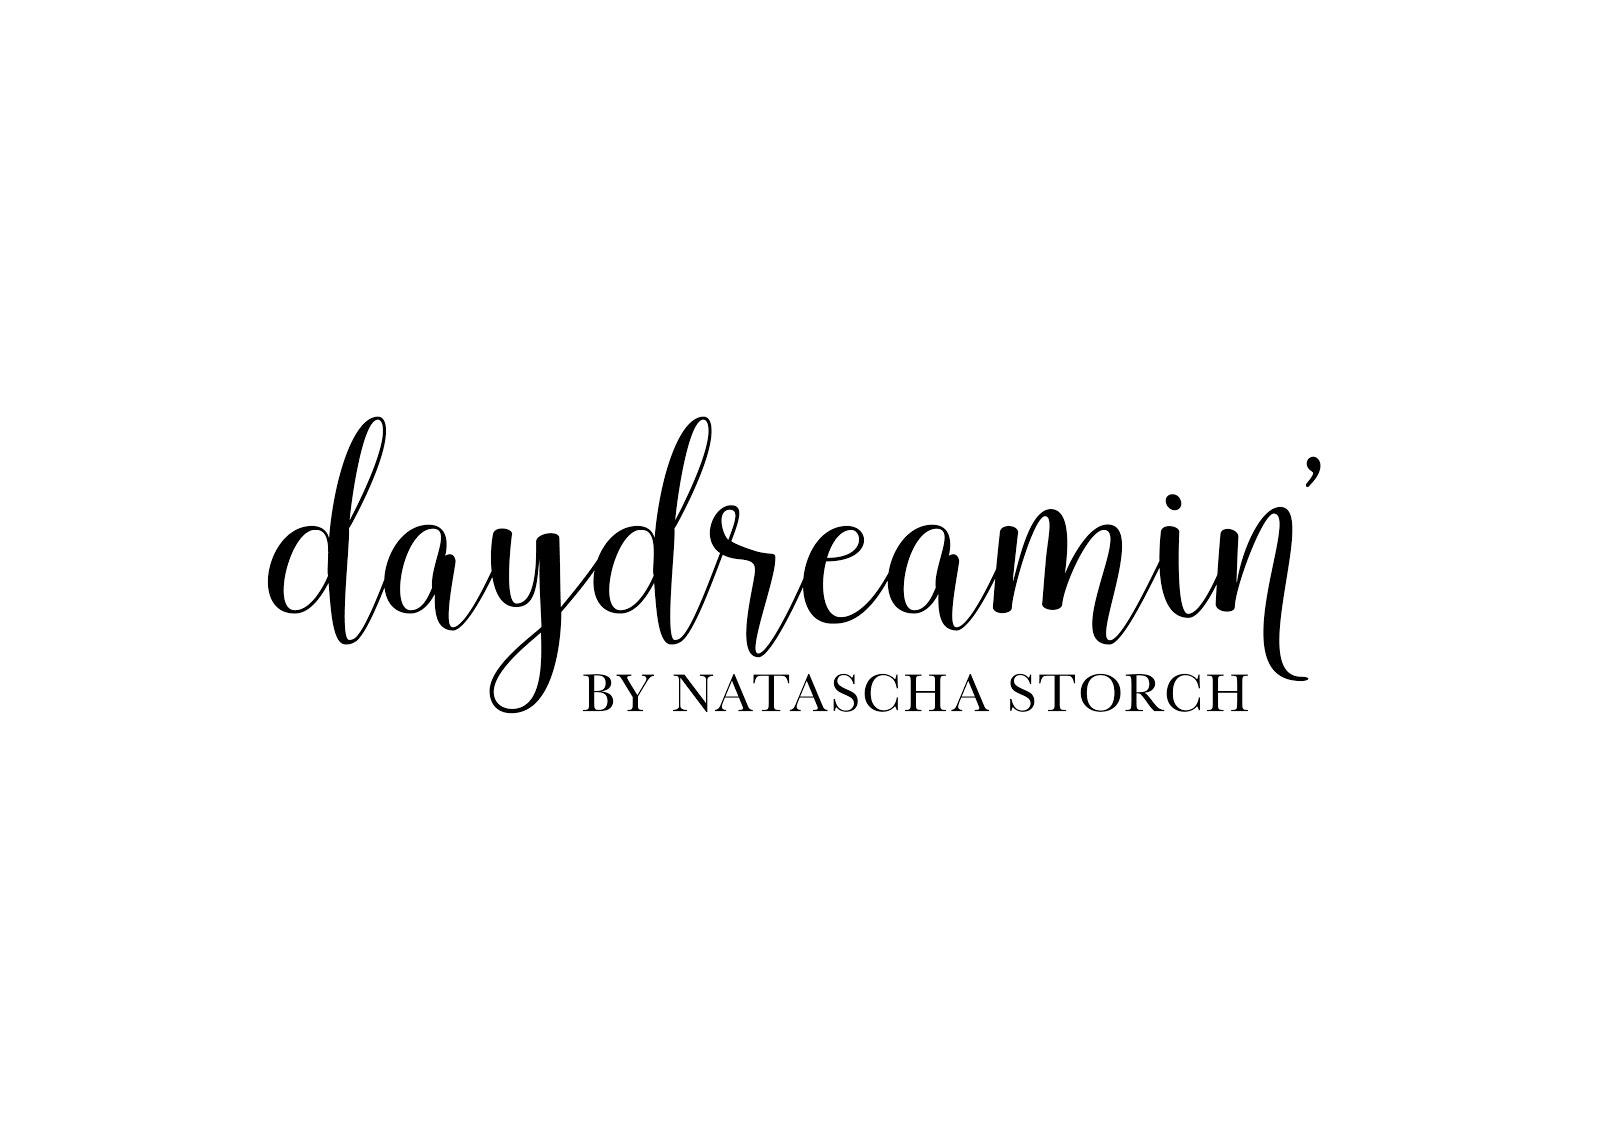 daydreamin - mein eigener Online-Shop